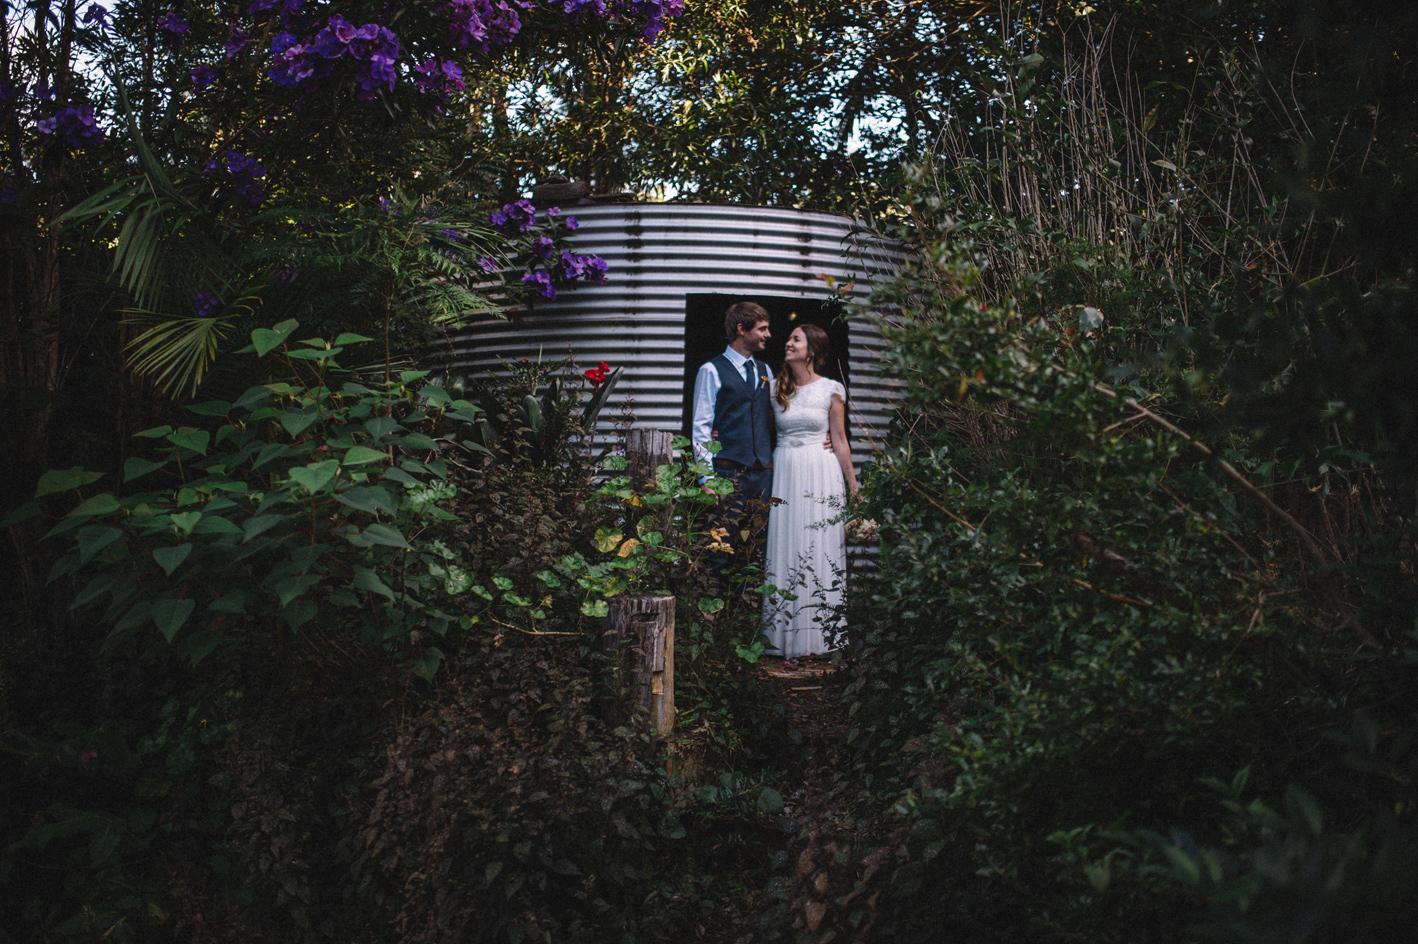 044-michelle-reagan-mount-tamborine-wedding-sophie-baker-photography